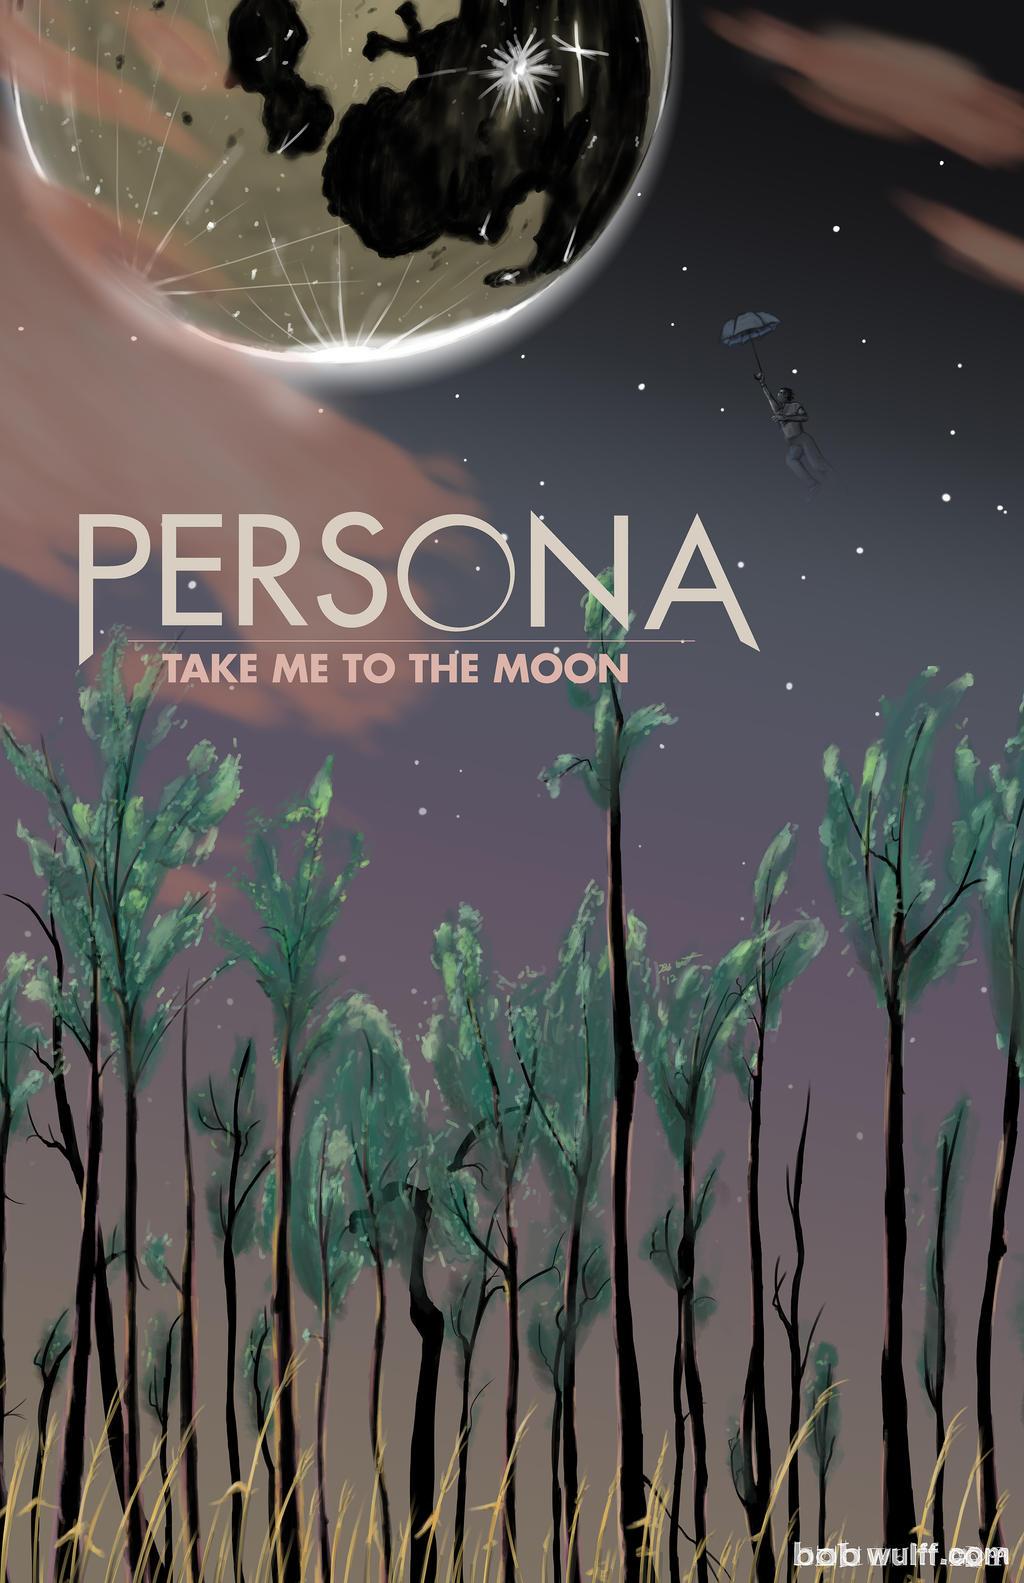 Persona Album Art by BobWulff